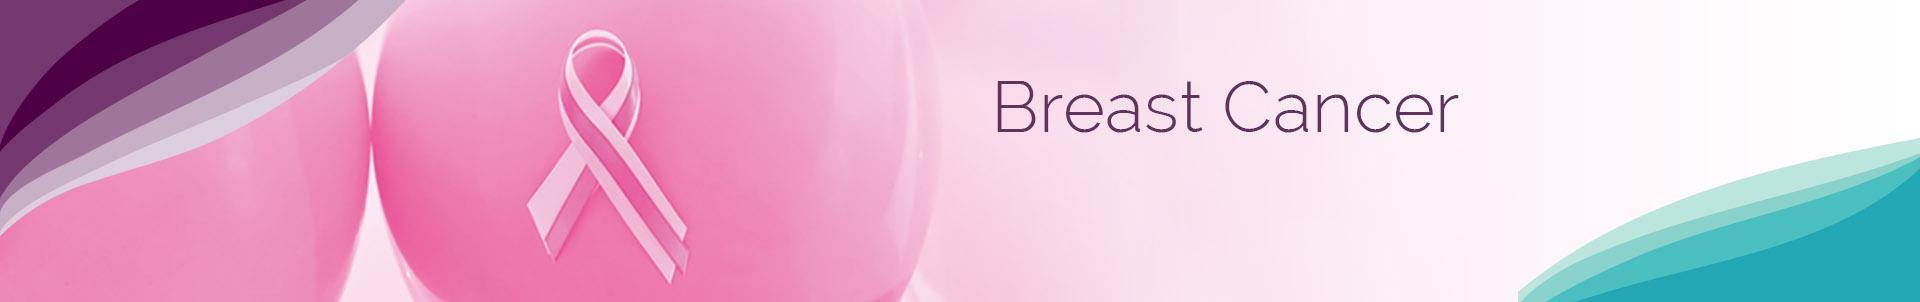 Breast Cancer Treatment at Apollo Cradle